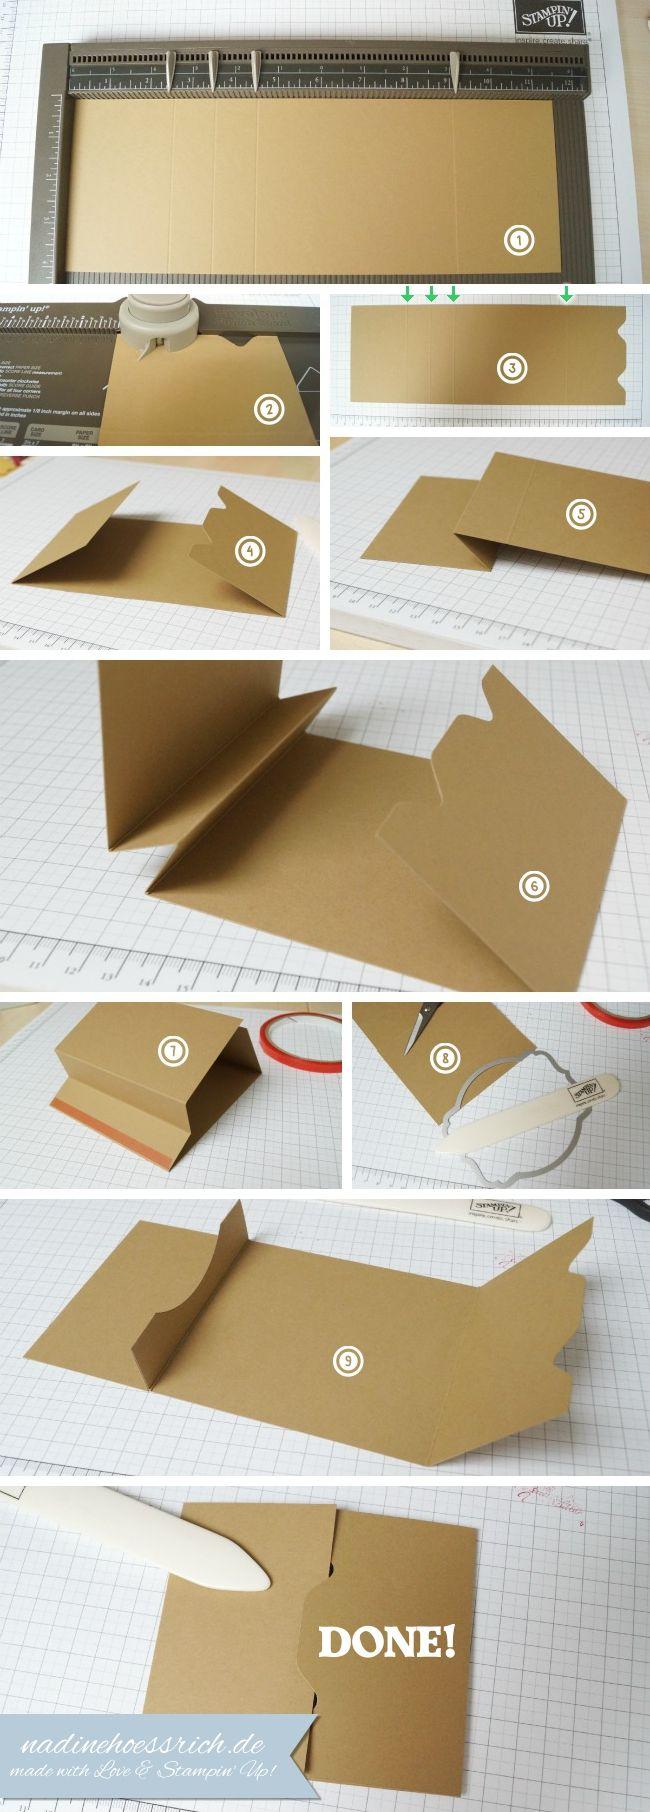 Tutorial: Geschenkgutschein-Karte / Gift-Card-Holder - www.nadinehoessrich.de #envelopepunchboard #wermemorykeepers